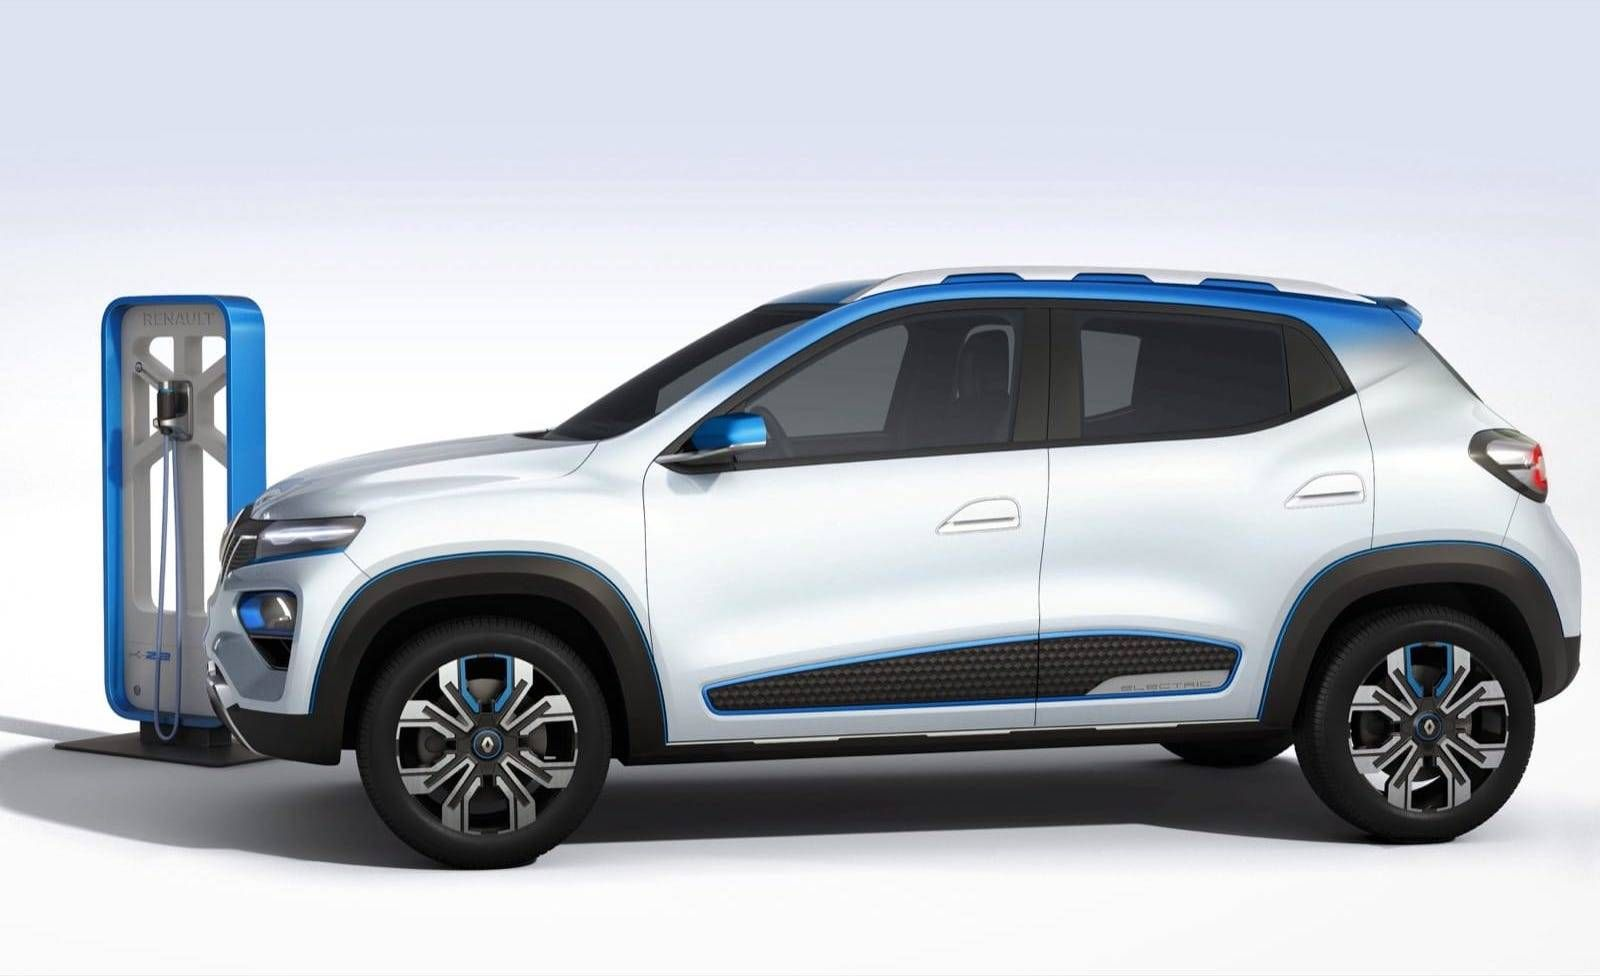 Dacia Confirmo Su Primer Modelo Puramente Electrico Llegara En 2020 Coche Electrico Fotos De Coches Modelos